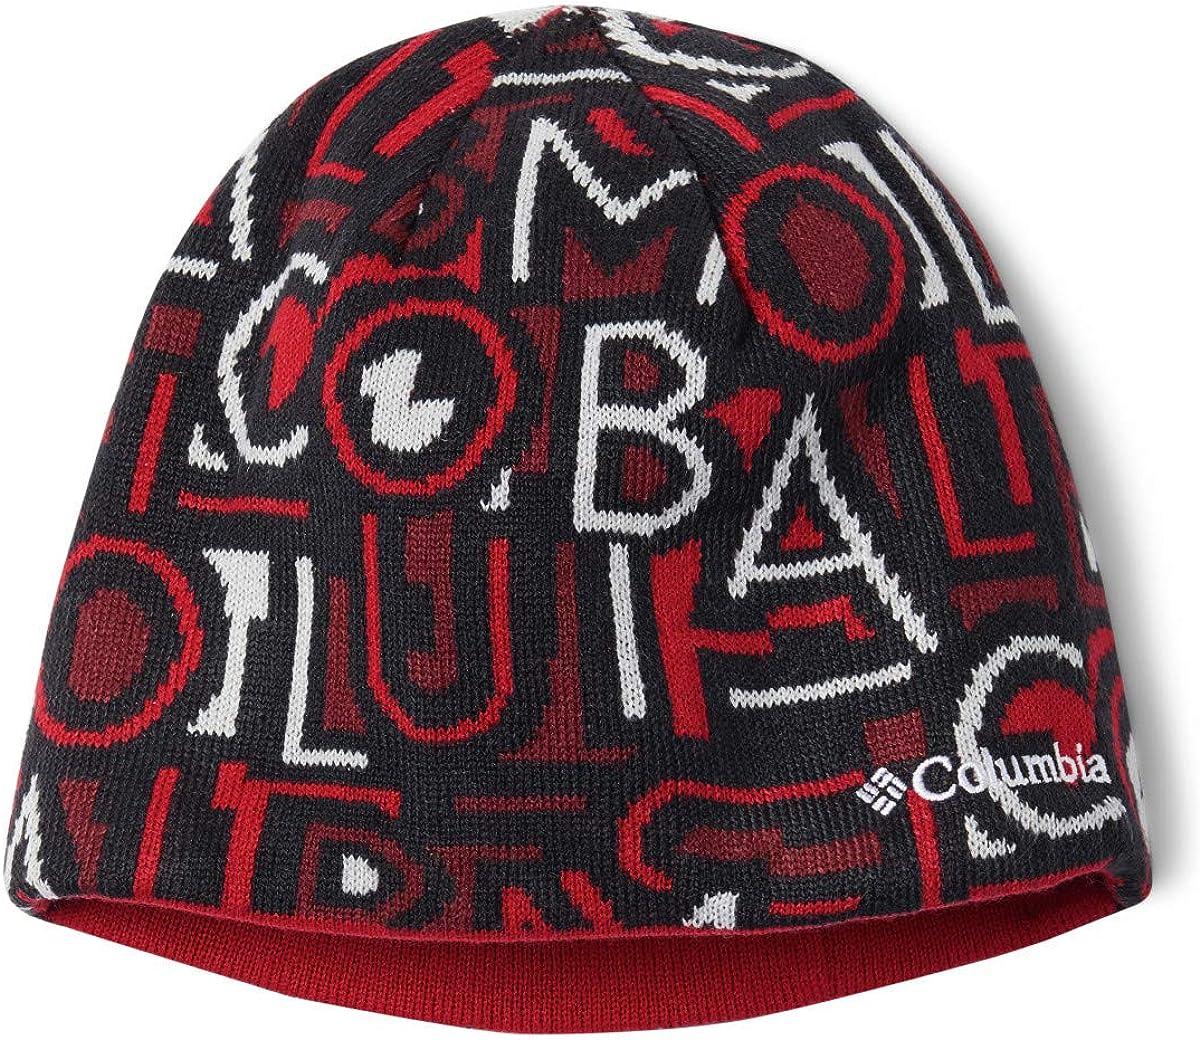 Columbia Boys' Toddler/Youth Urbanization Mix Beanie